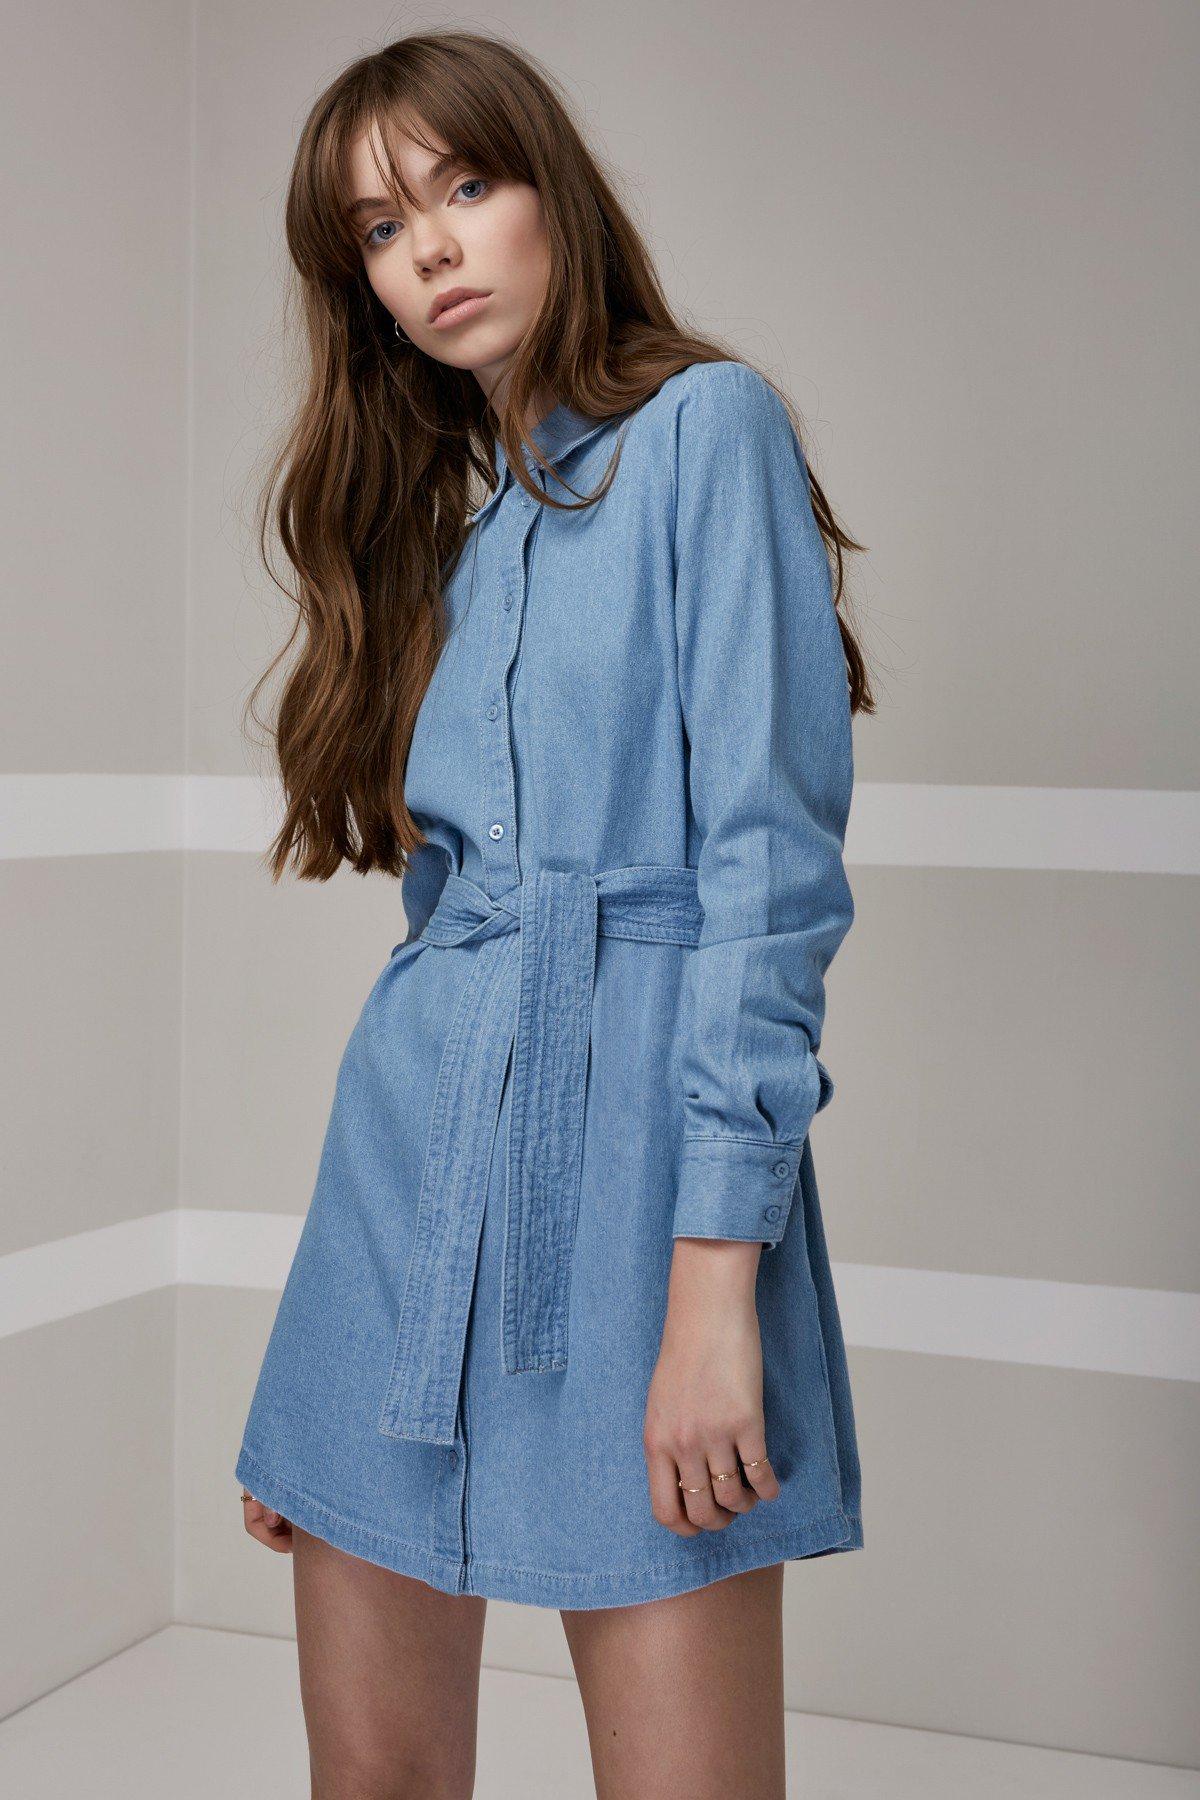 Shop The Fifth Blue Eyes Shirt Dress.